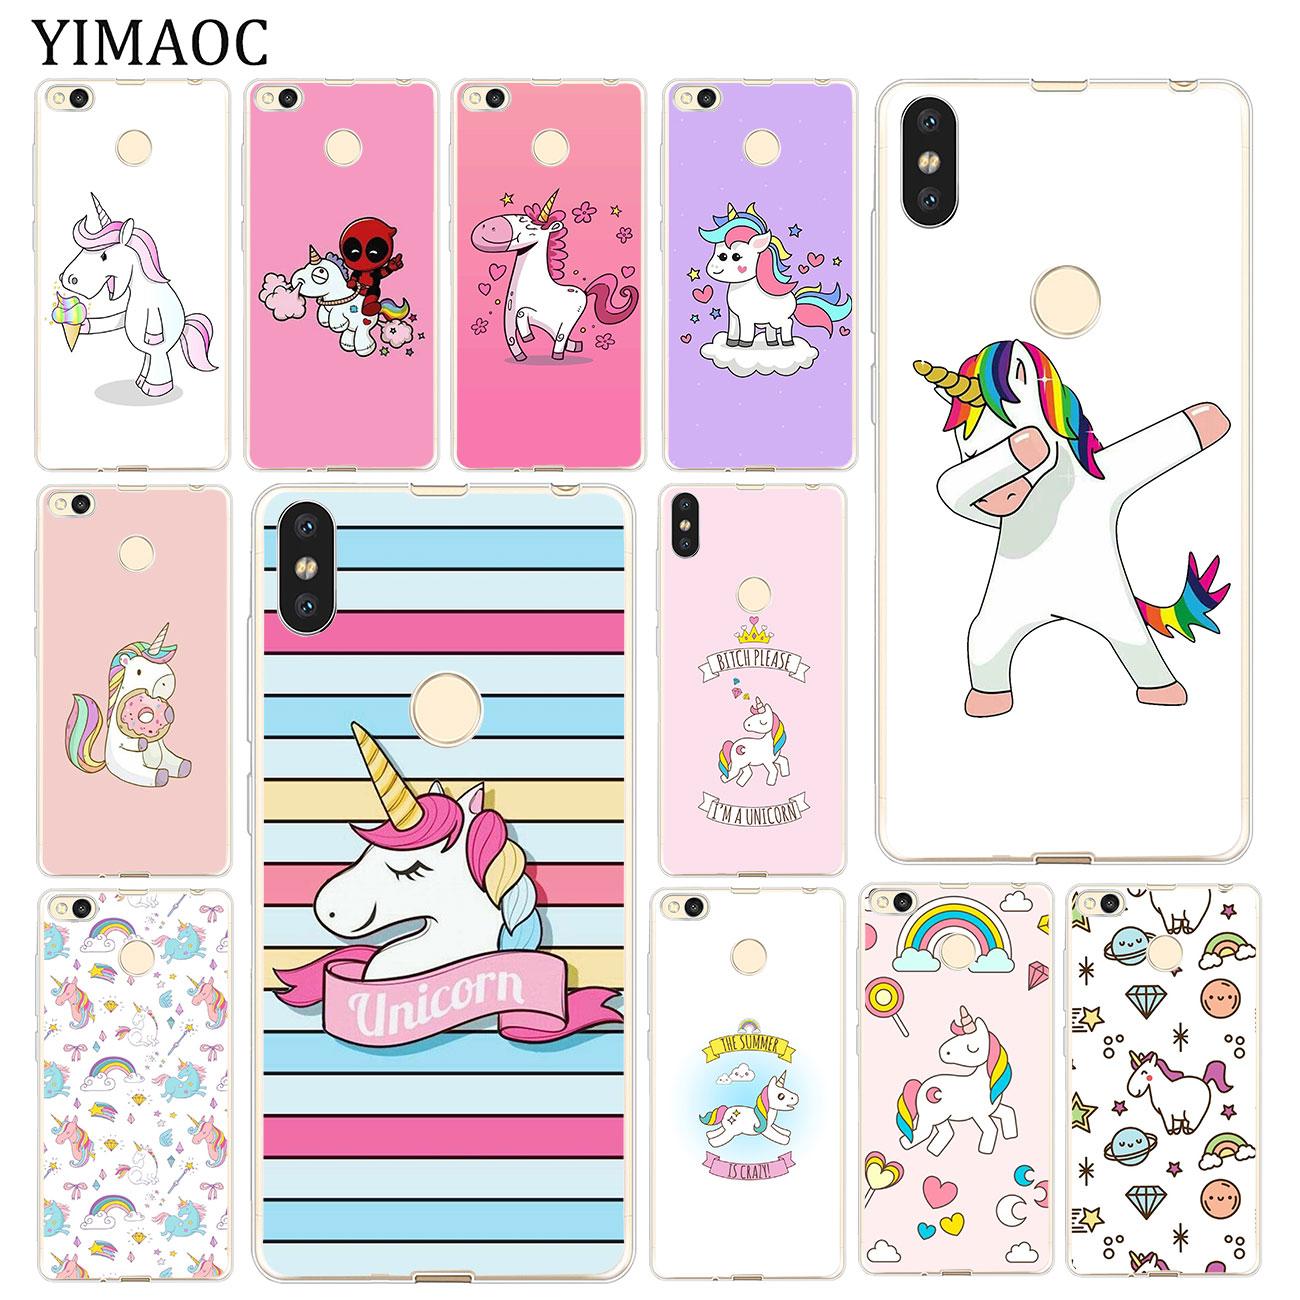 YIMAOC UNICORN cartoon funny Horse Soft Case for Xiaomi Mi 9 9T CC9 CC9E A3 Pro 8 SE A2 Lite A1 pocophone f1 MiX 2S MAX 3 MI9